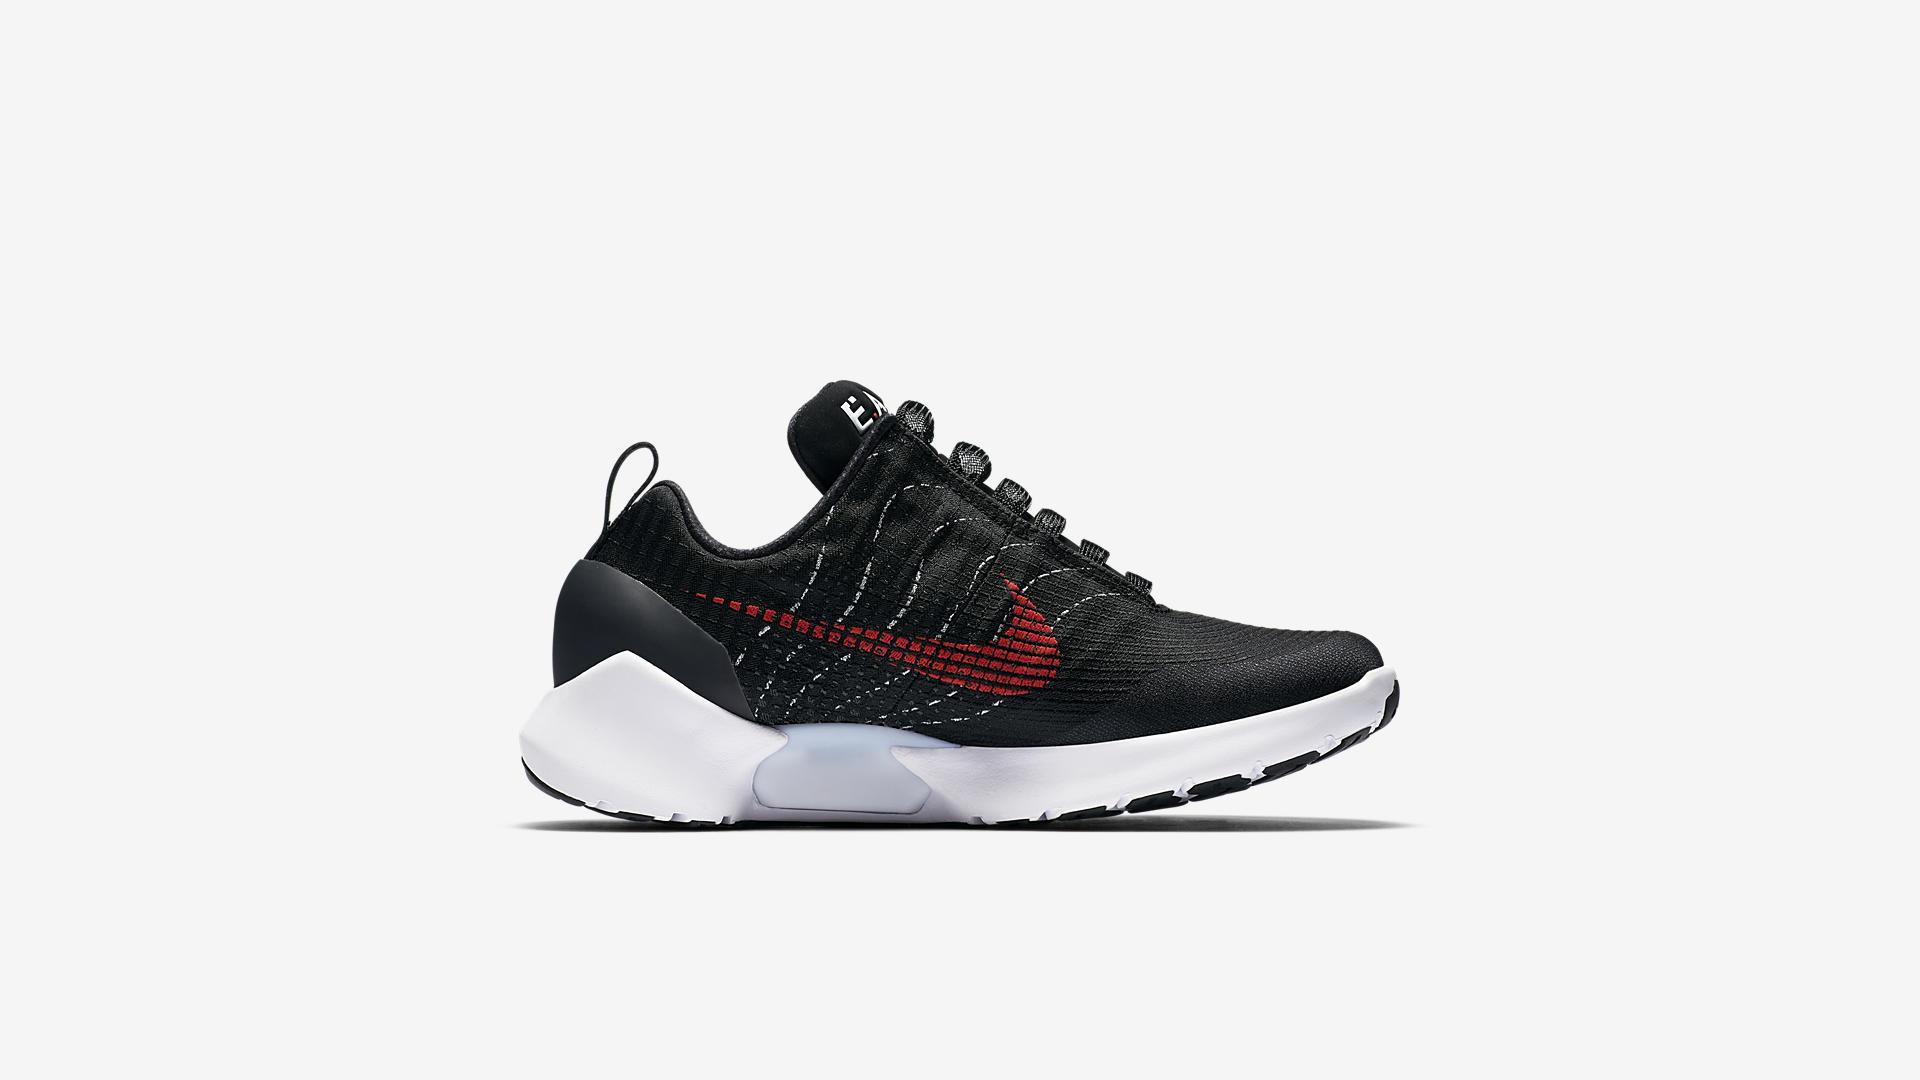 843871 005 Nike HyperAdapt 1.0 University Red 3